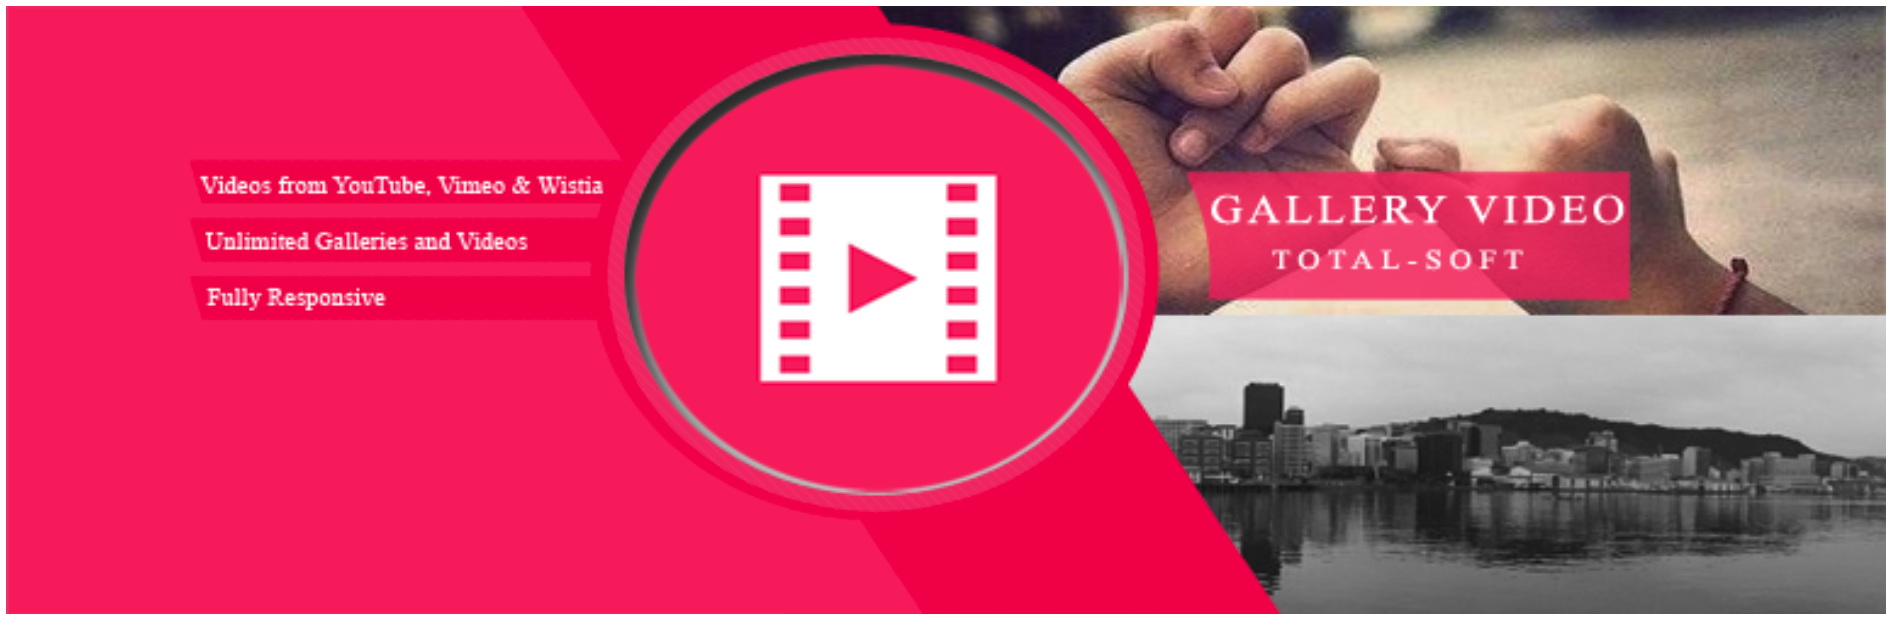 Video Gallery|YouTubeをWordPressに表示するプラグイン